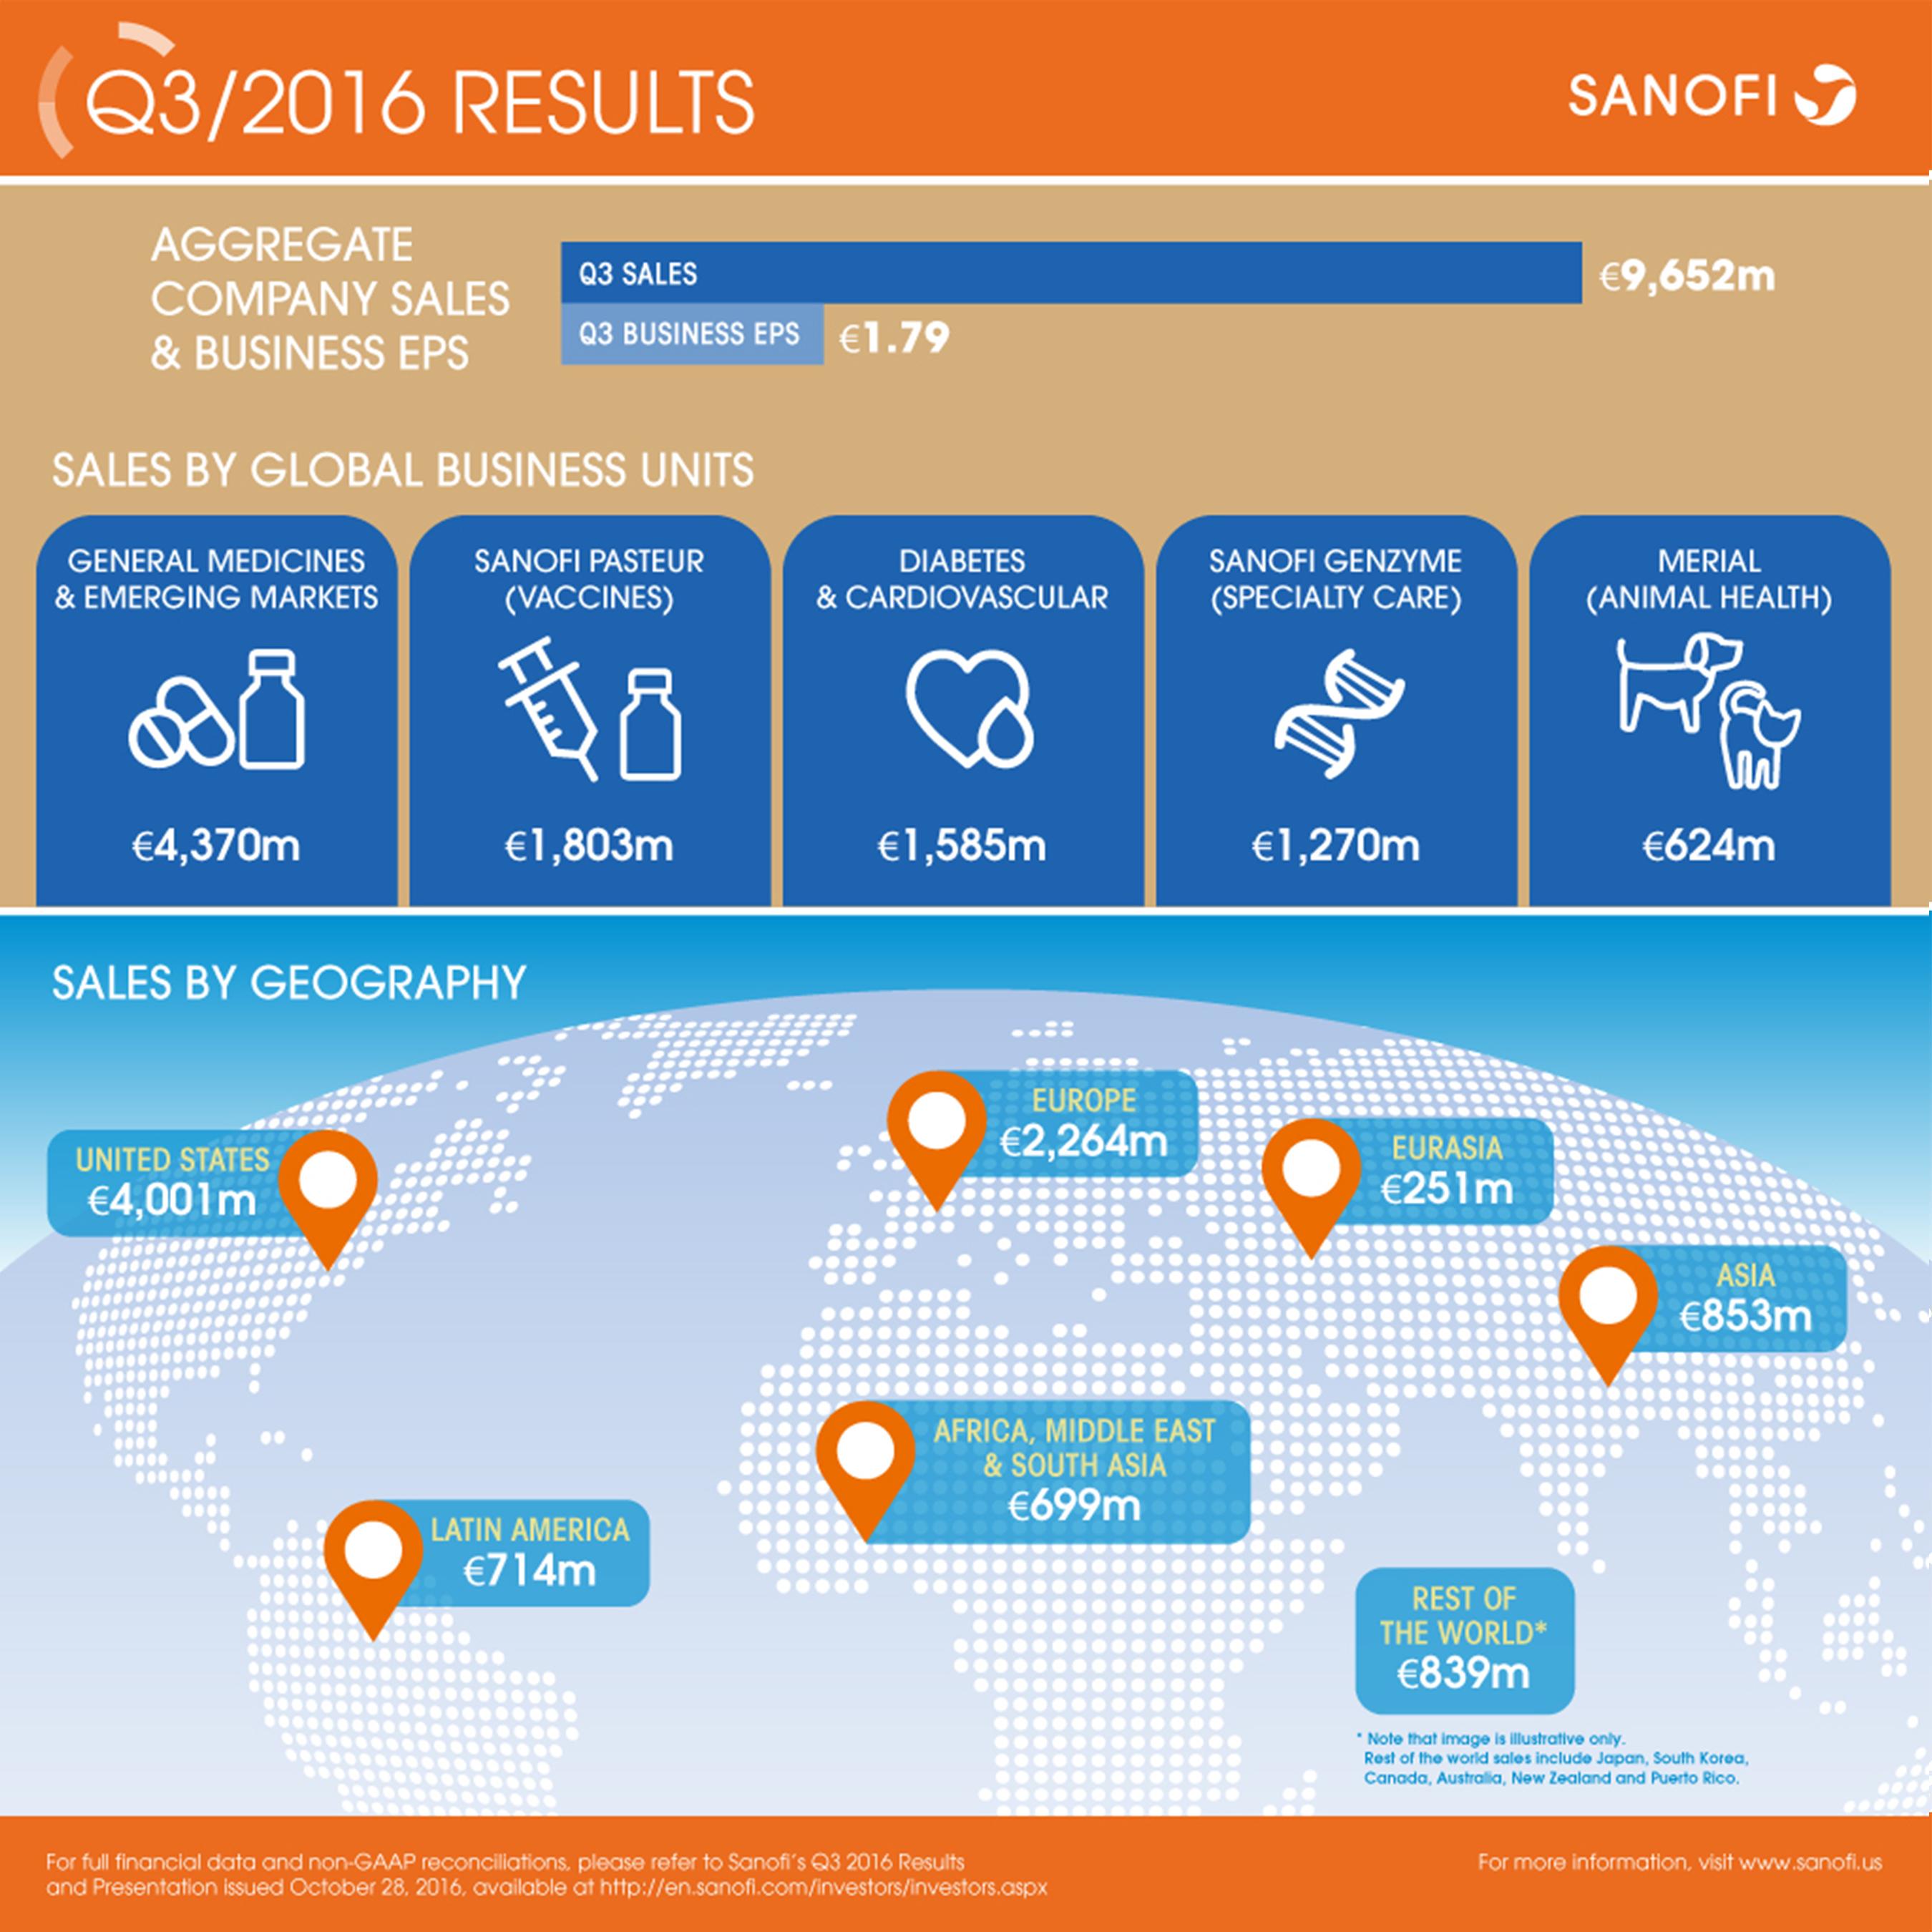 Sanofi Q3 2016 Earnings Results Infographic